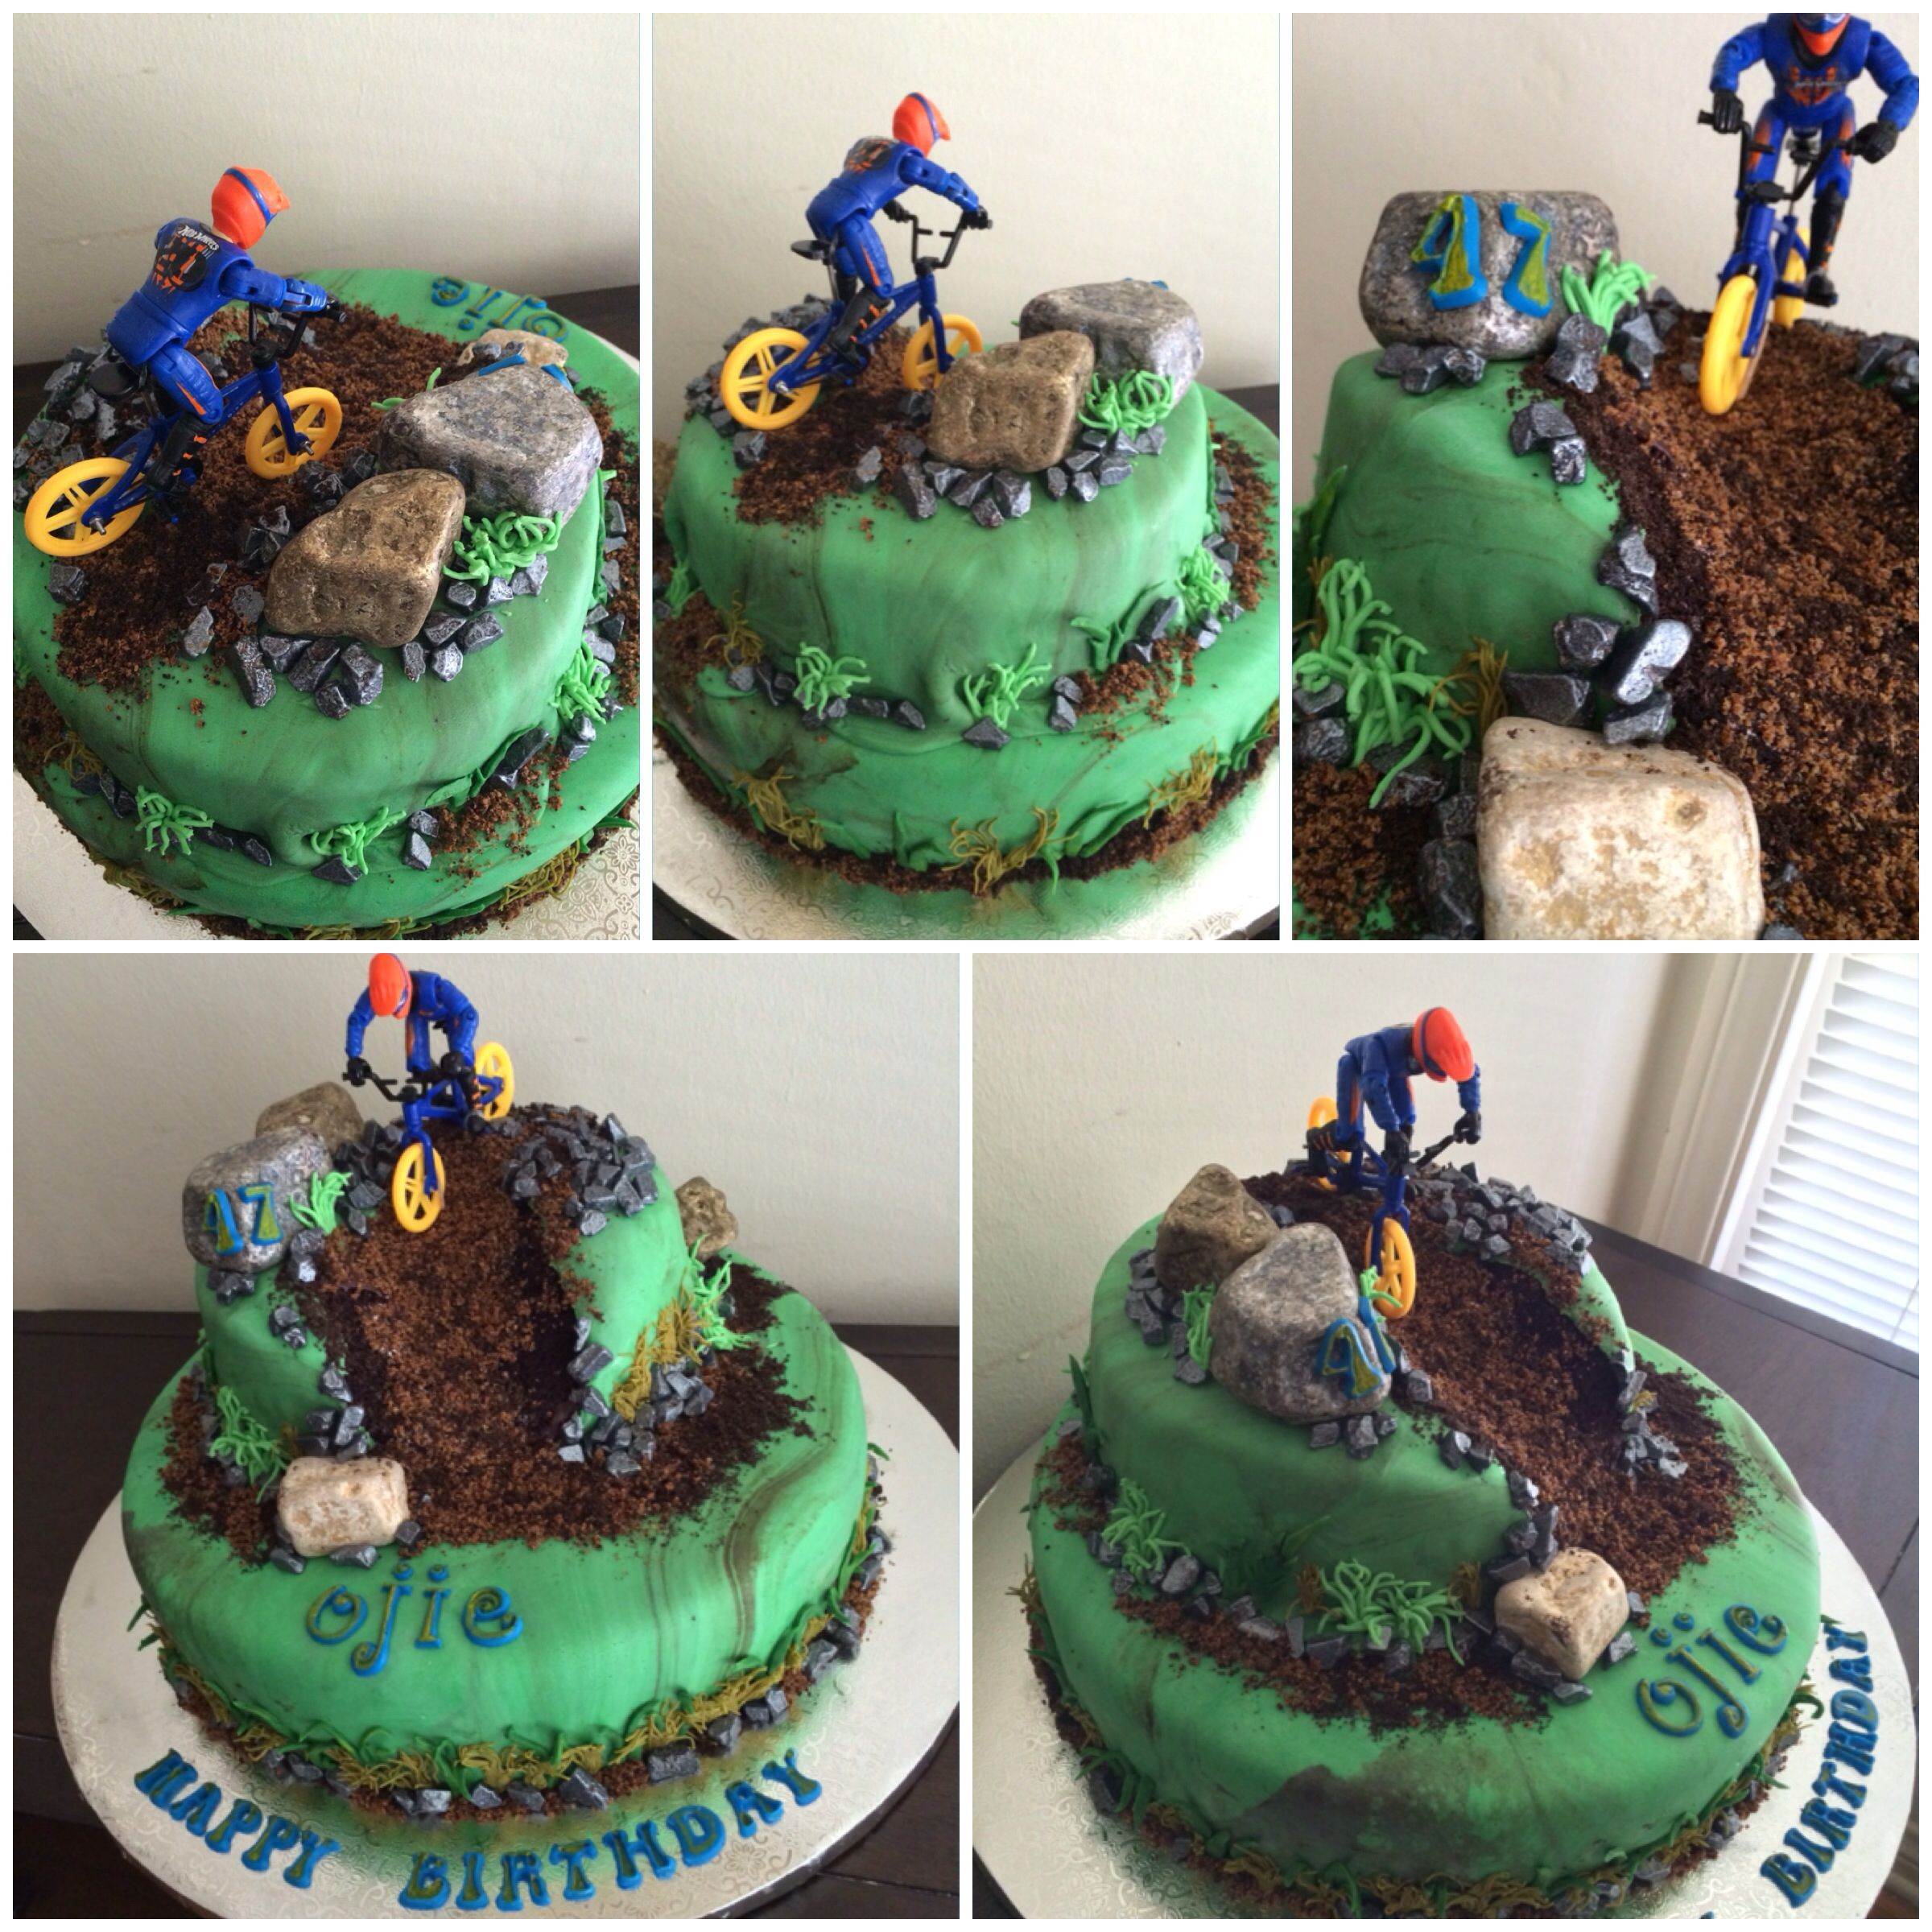 Mountain Biking Birthday Cake With Images Bike Cakes Birthday